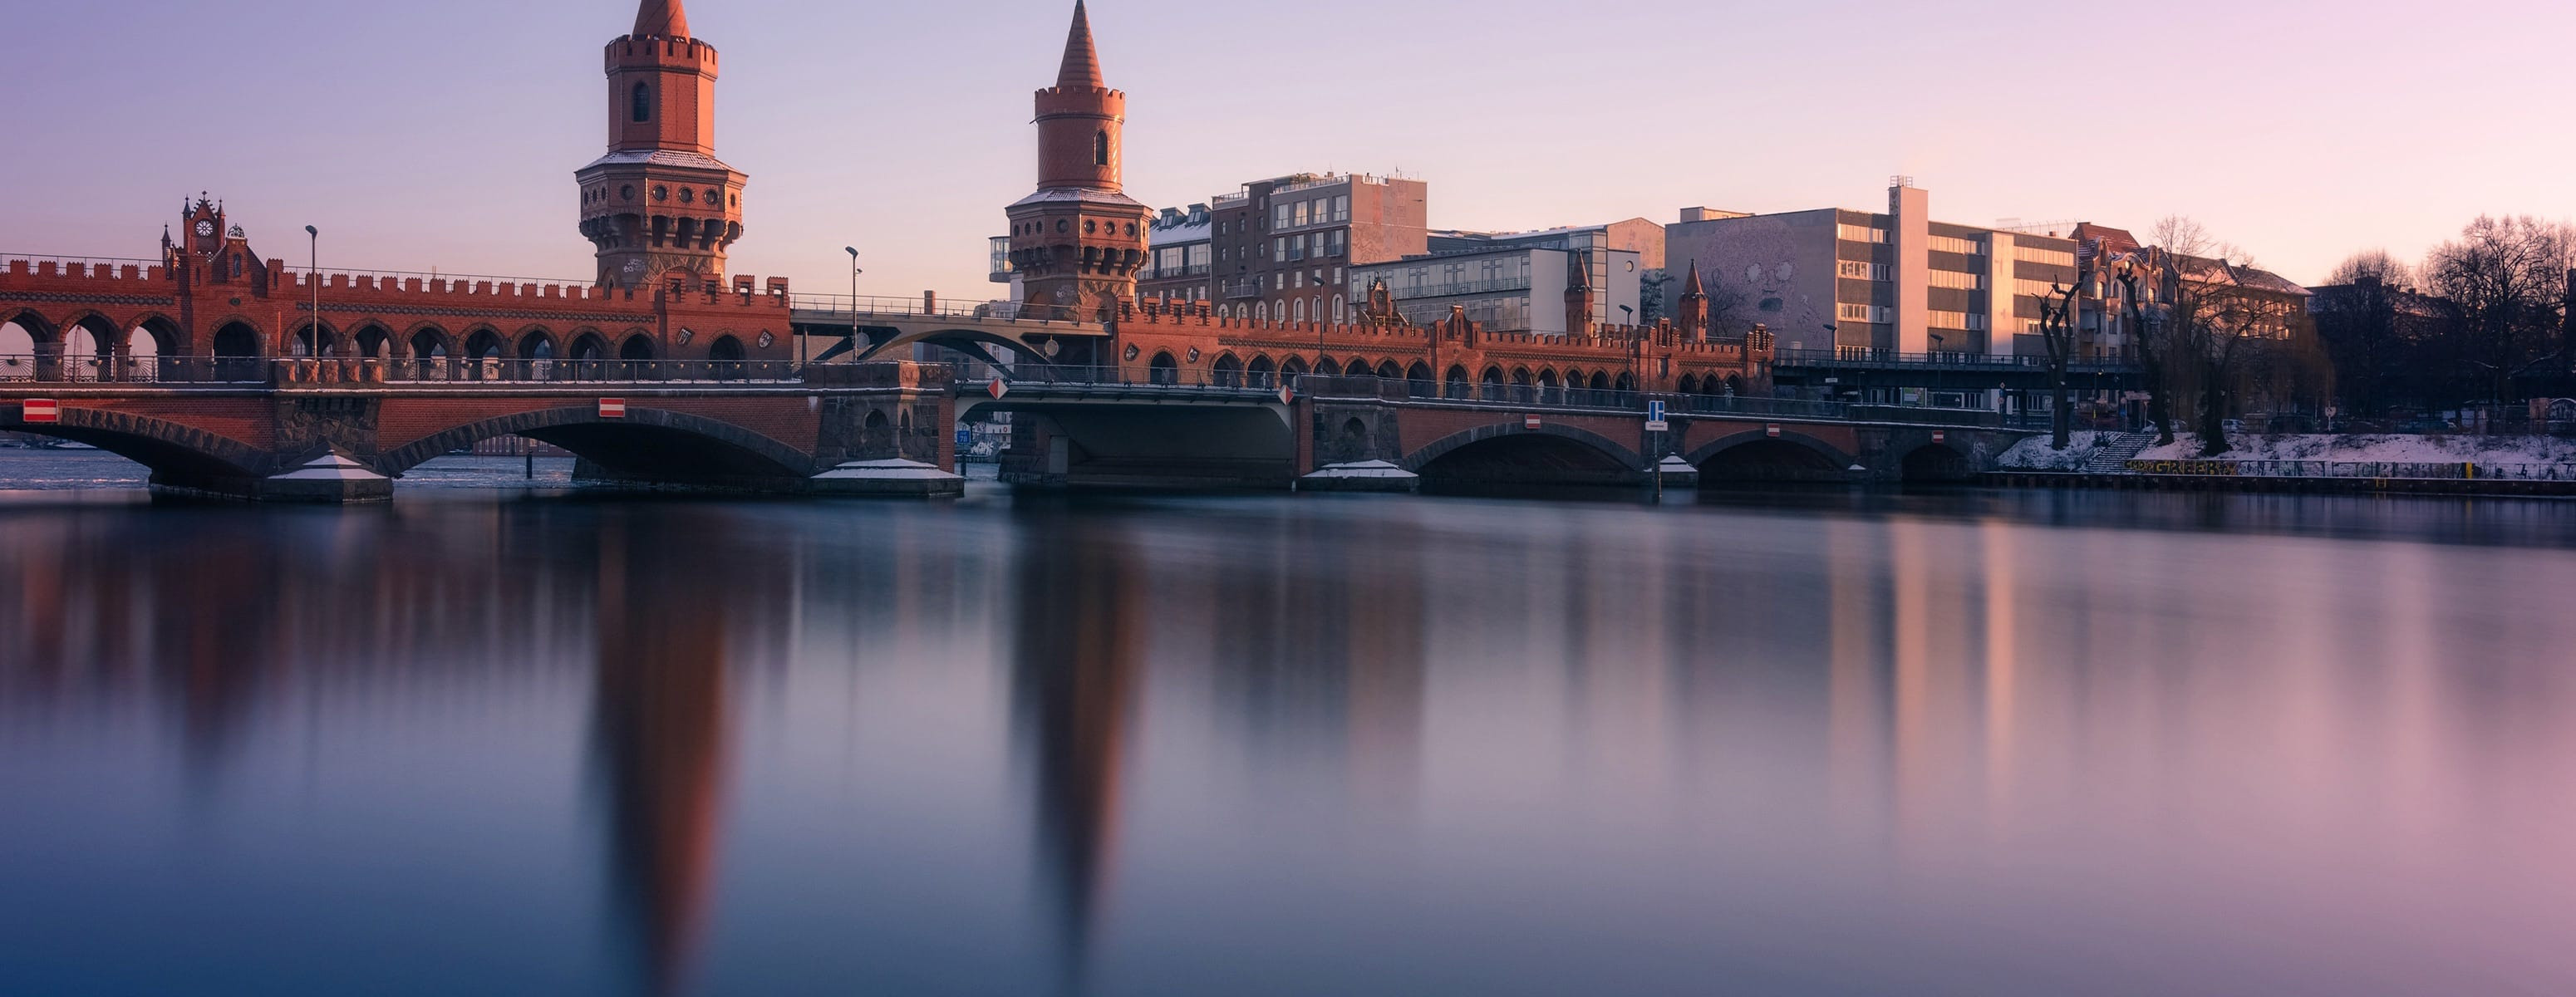 Hoppegarten 2018 (with Photos): Top 20 Places to Stay in Hoppegarten ...